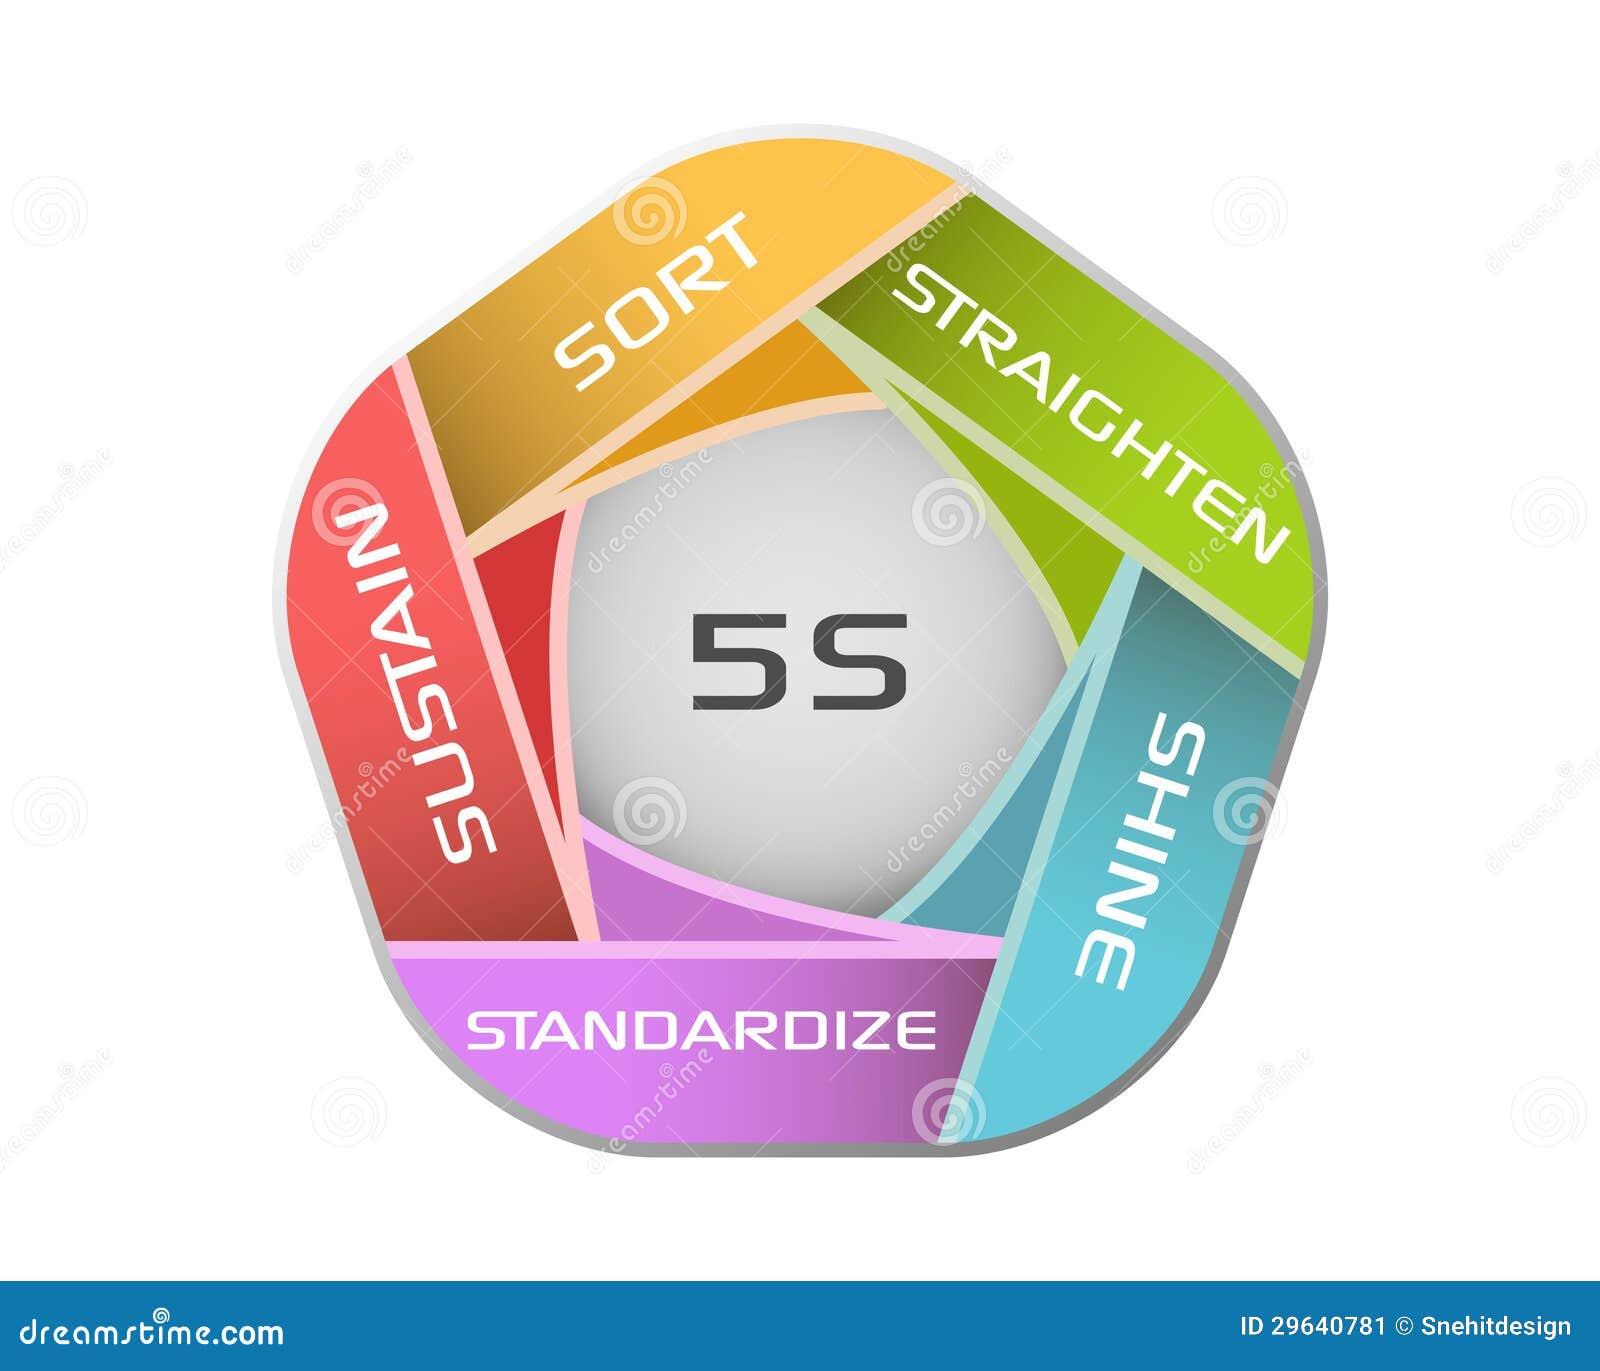 5S Methodology Stock Illustration. Illustration Of Evolve